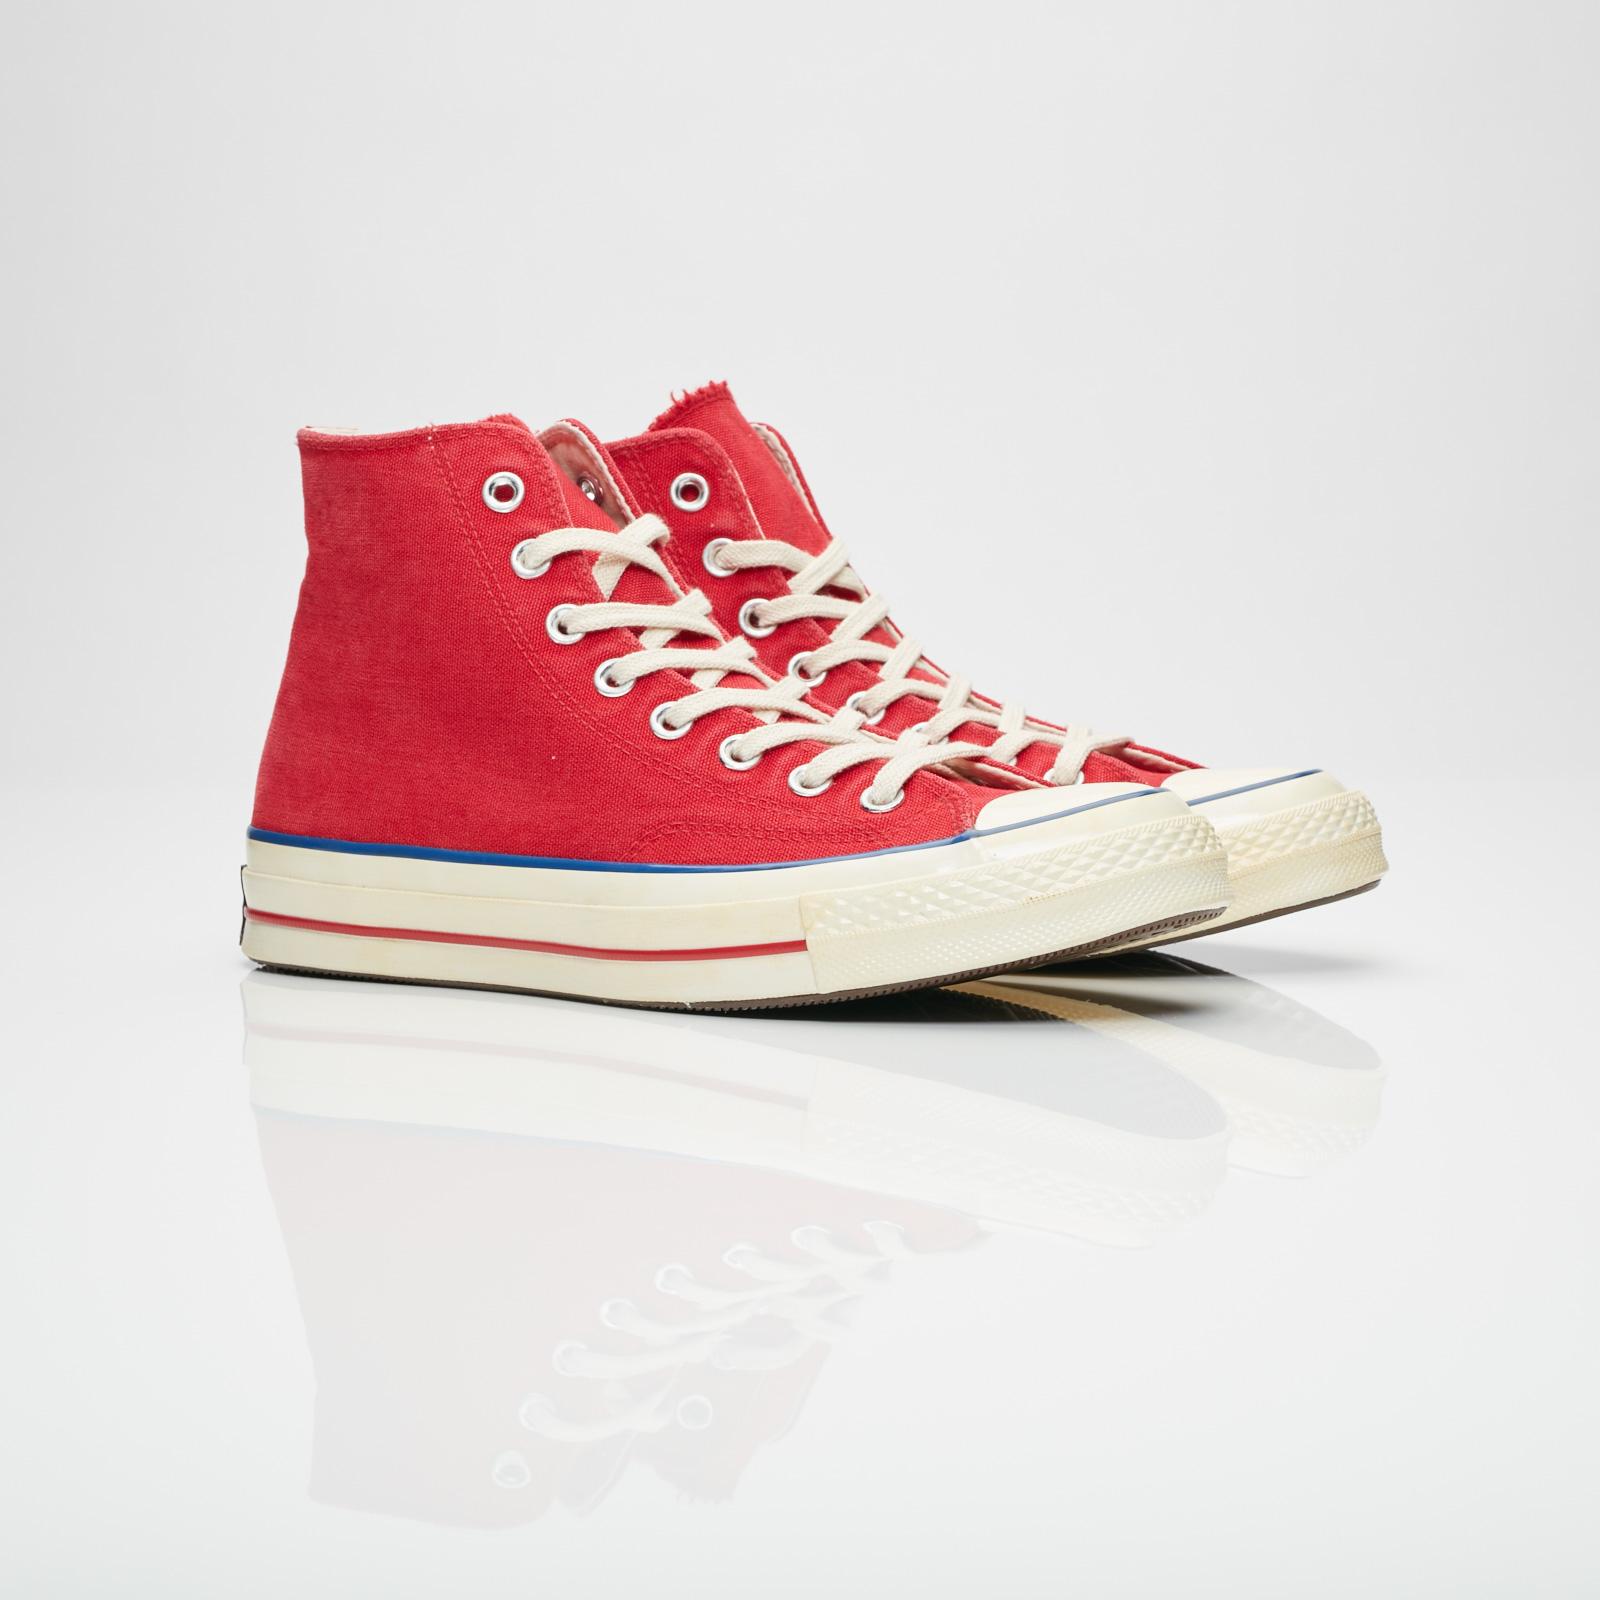 7e64a77ea6e37a Converse Chuck Taylor All Star 1970s - 159567c - Sneakersnstuff ...